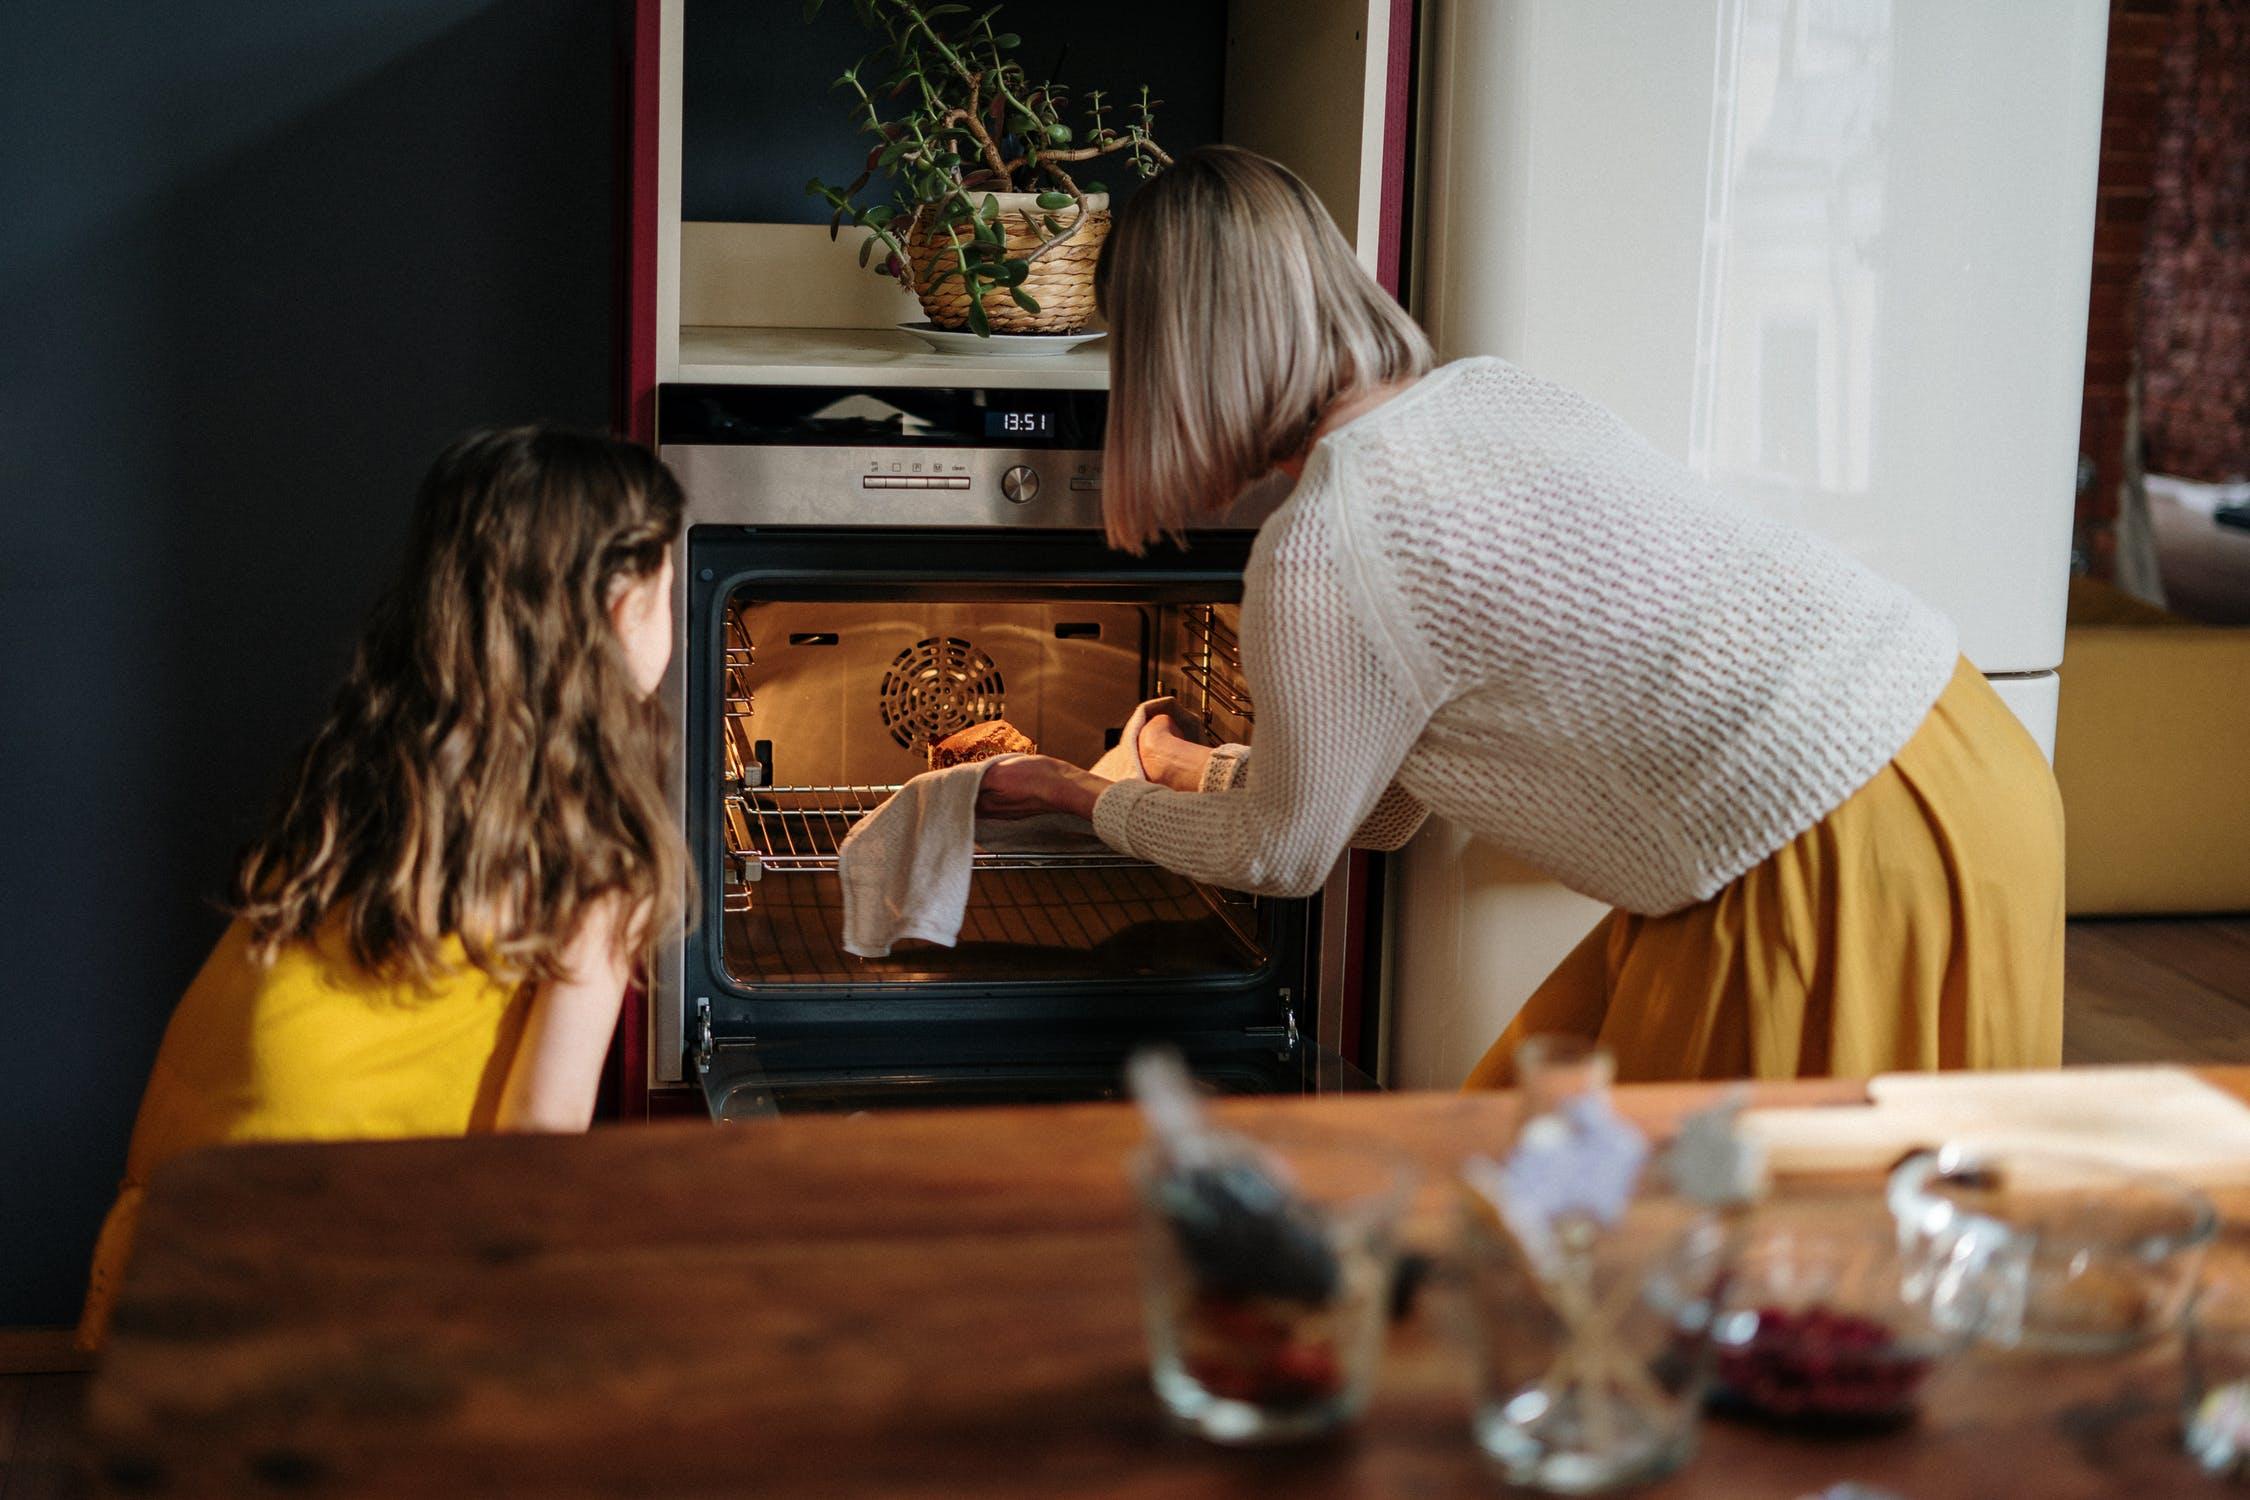 yeobuild homestore singapore Common Oven Problems and How to Fix Them yeobuild homestore singapore